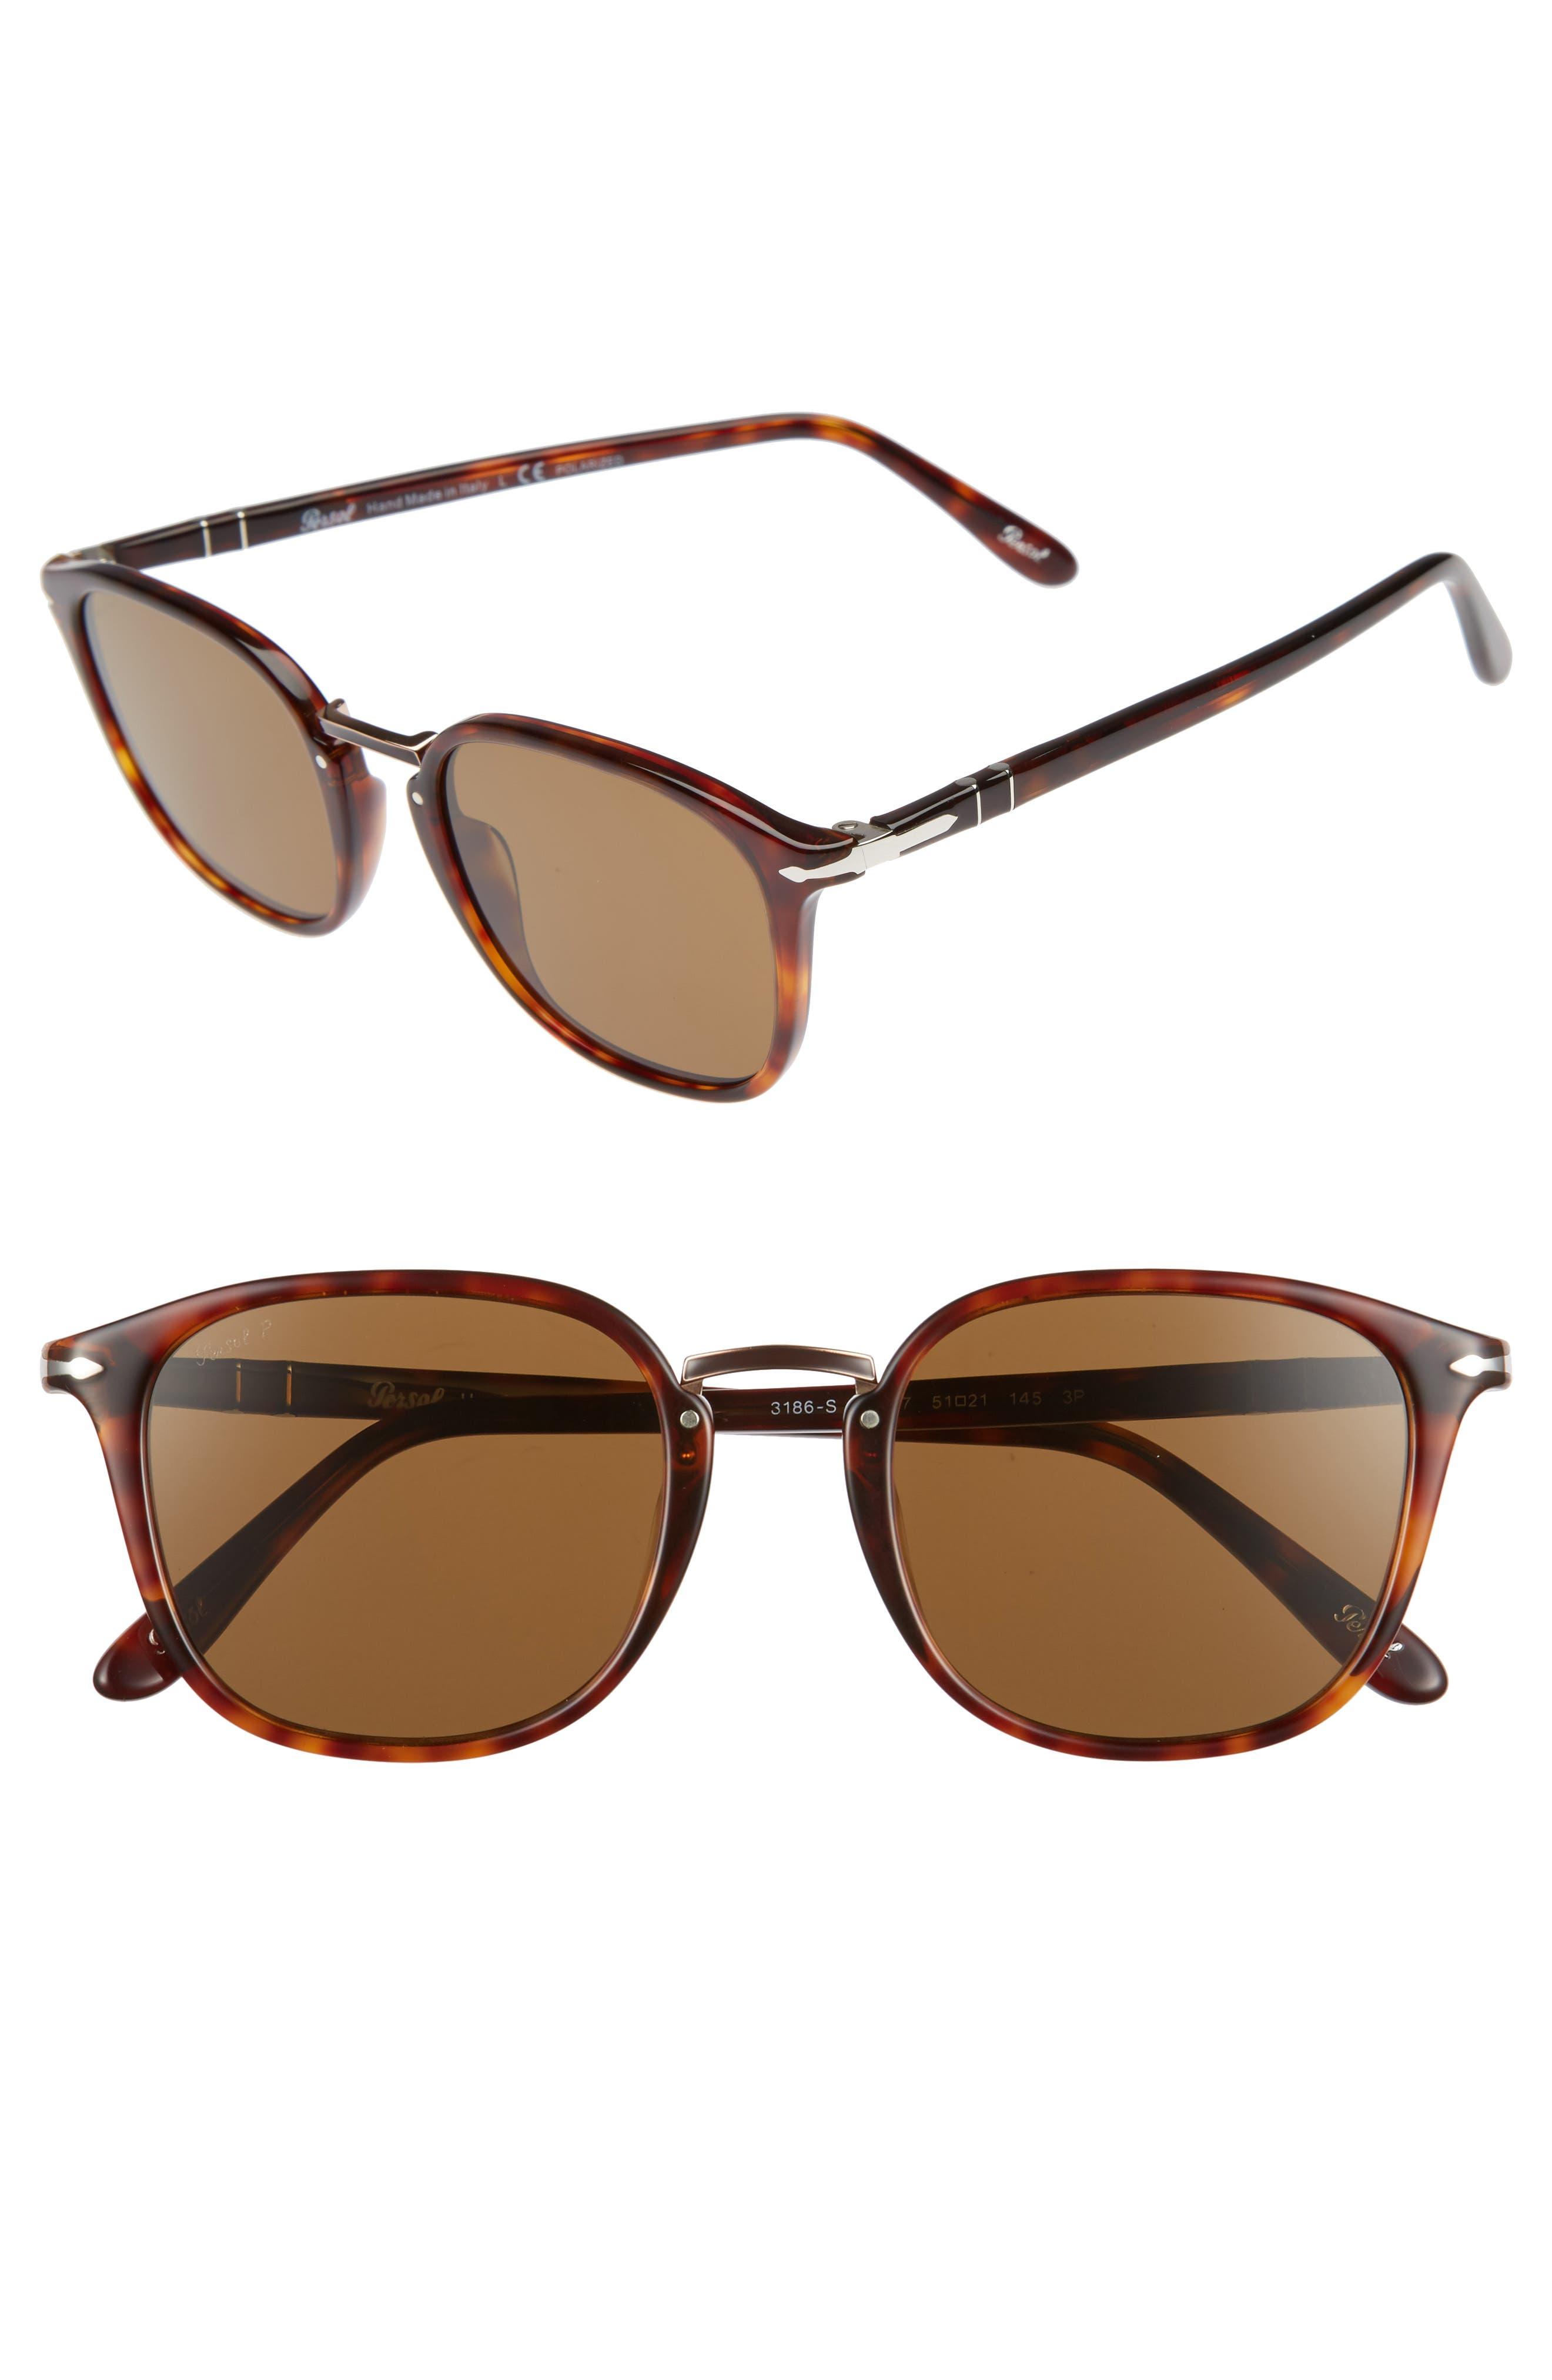 Phantos 51mm Polarized Sunglasses,                         Main,                         color, 234